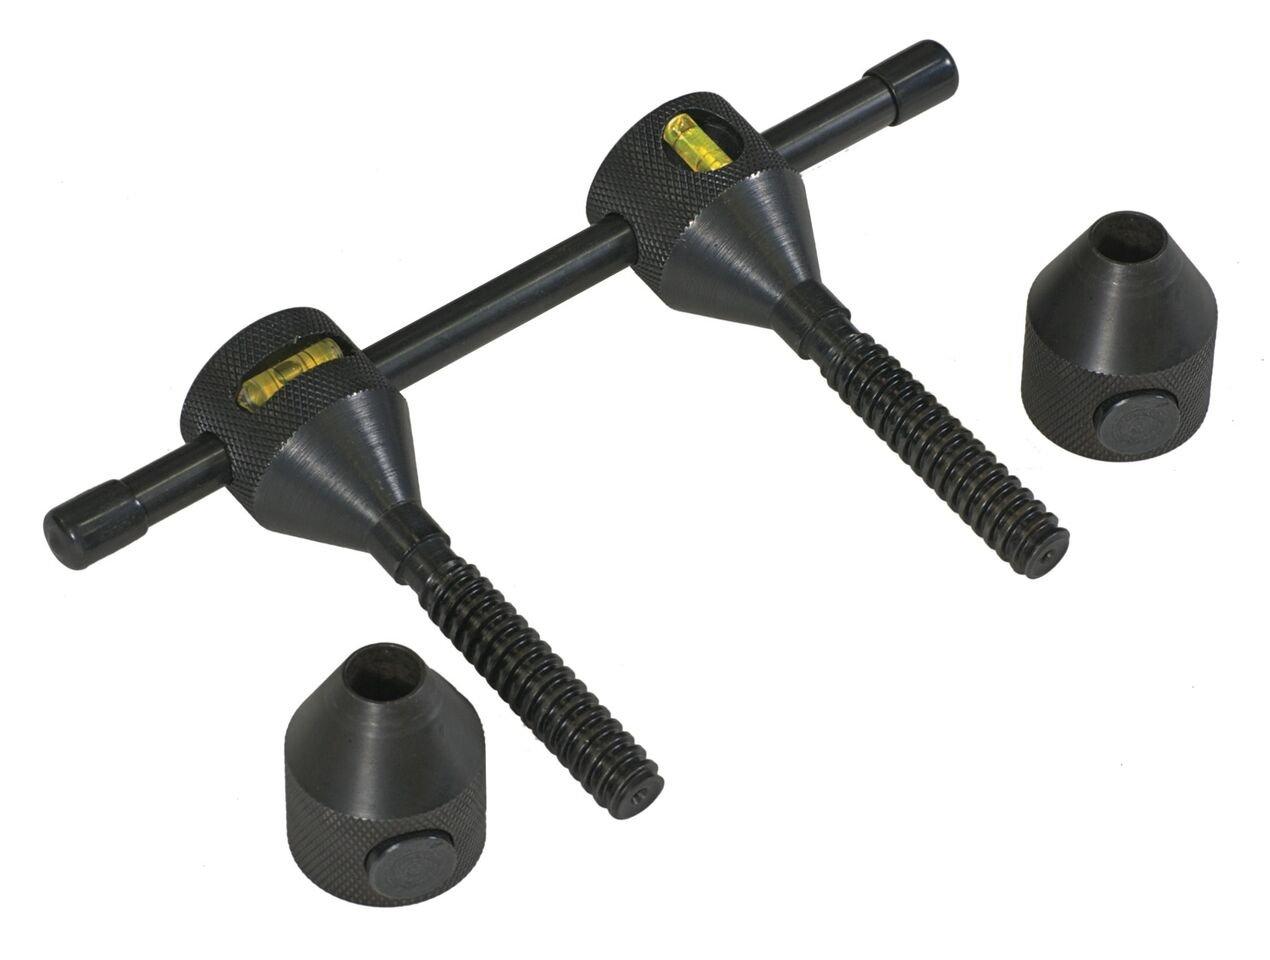 Sumner Manufacturing 781240 Flange Leveler, Steel Pins with Levels, 5/8'' - 1-5/8'', Sold per Pair